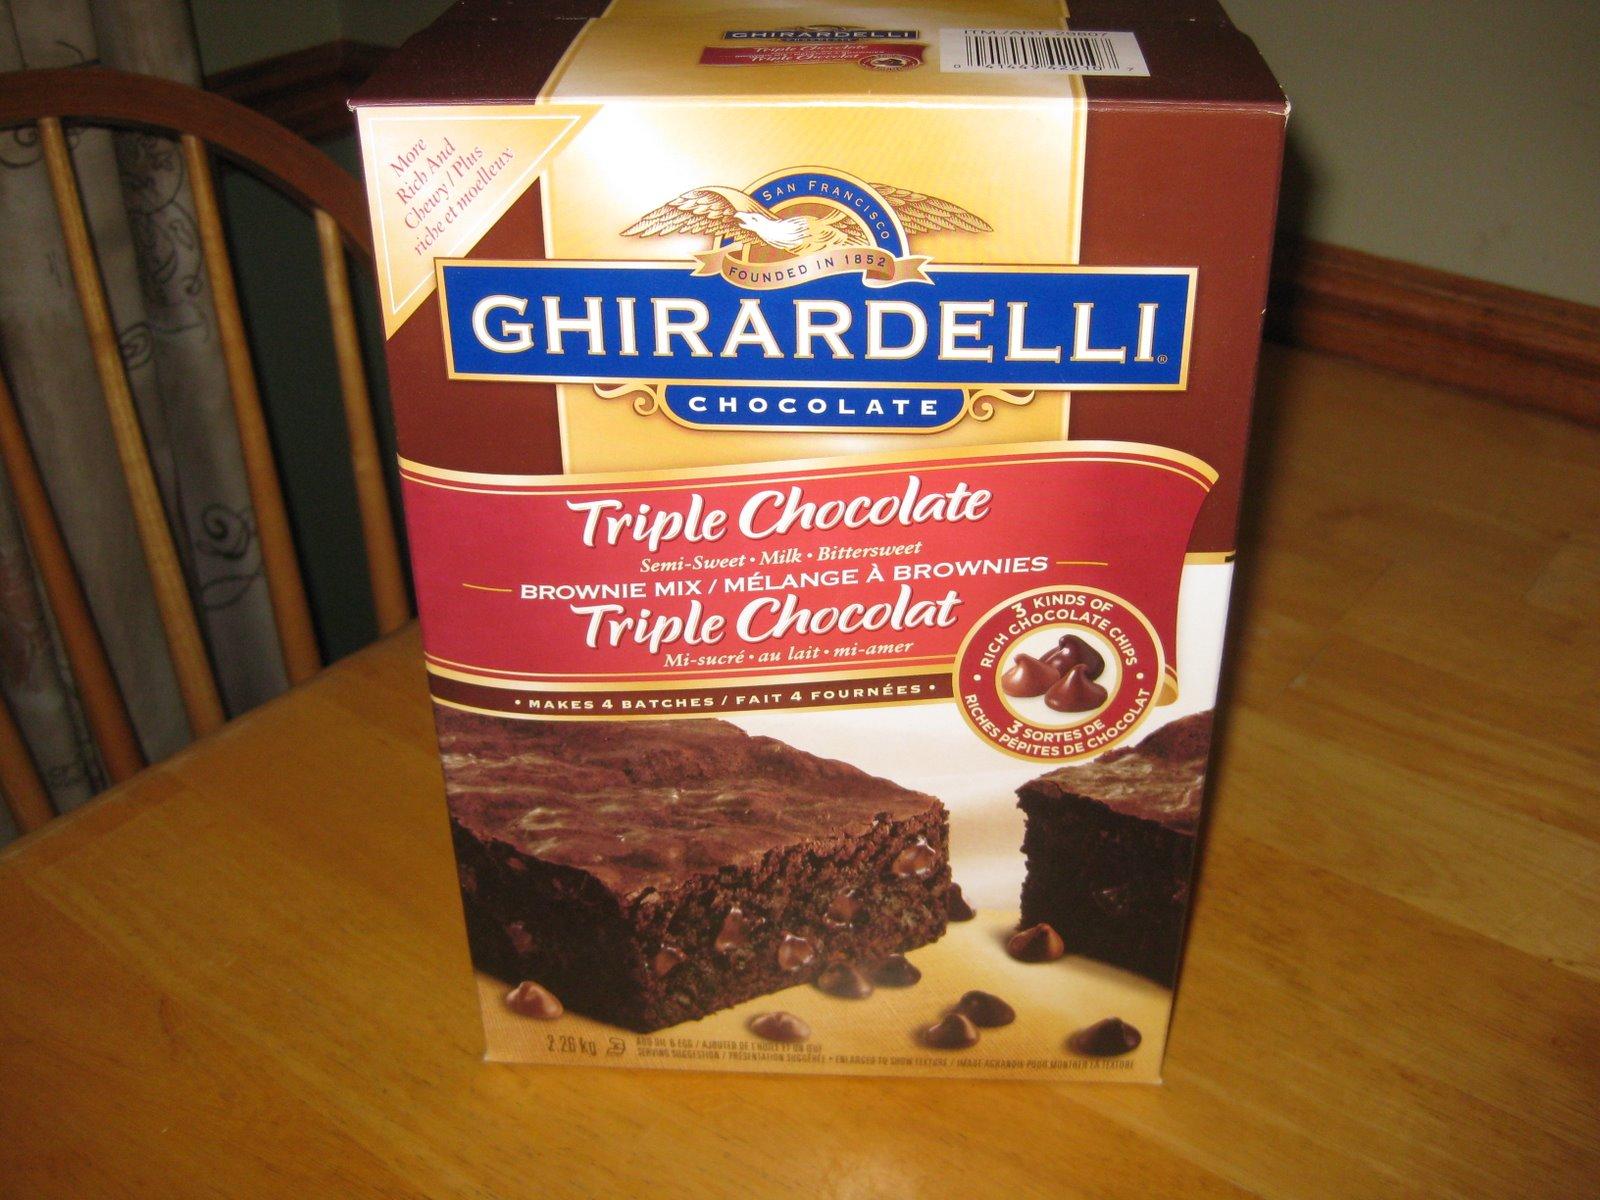 Costco Ghirardelli Chocolate Chips